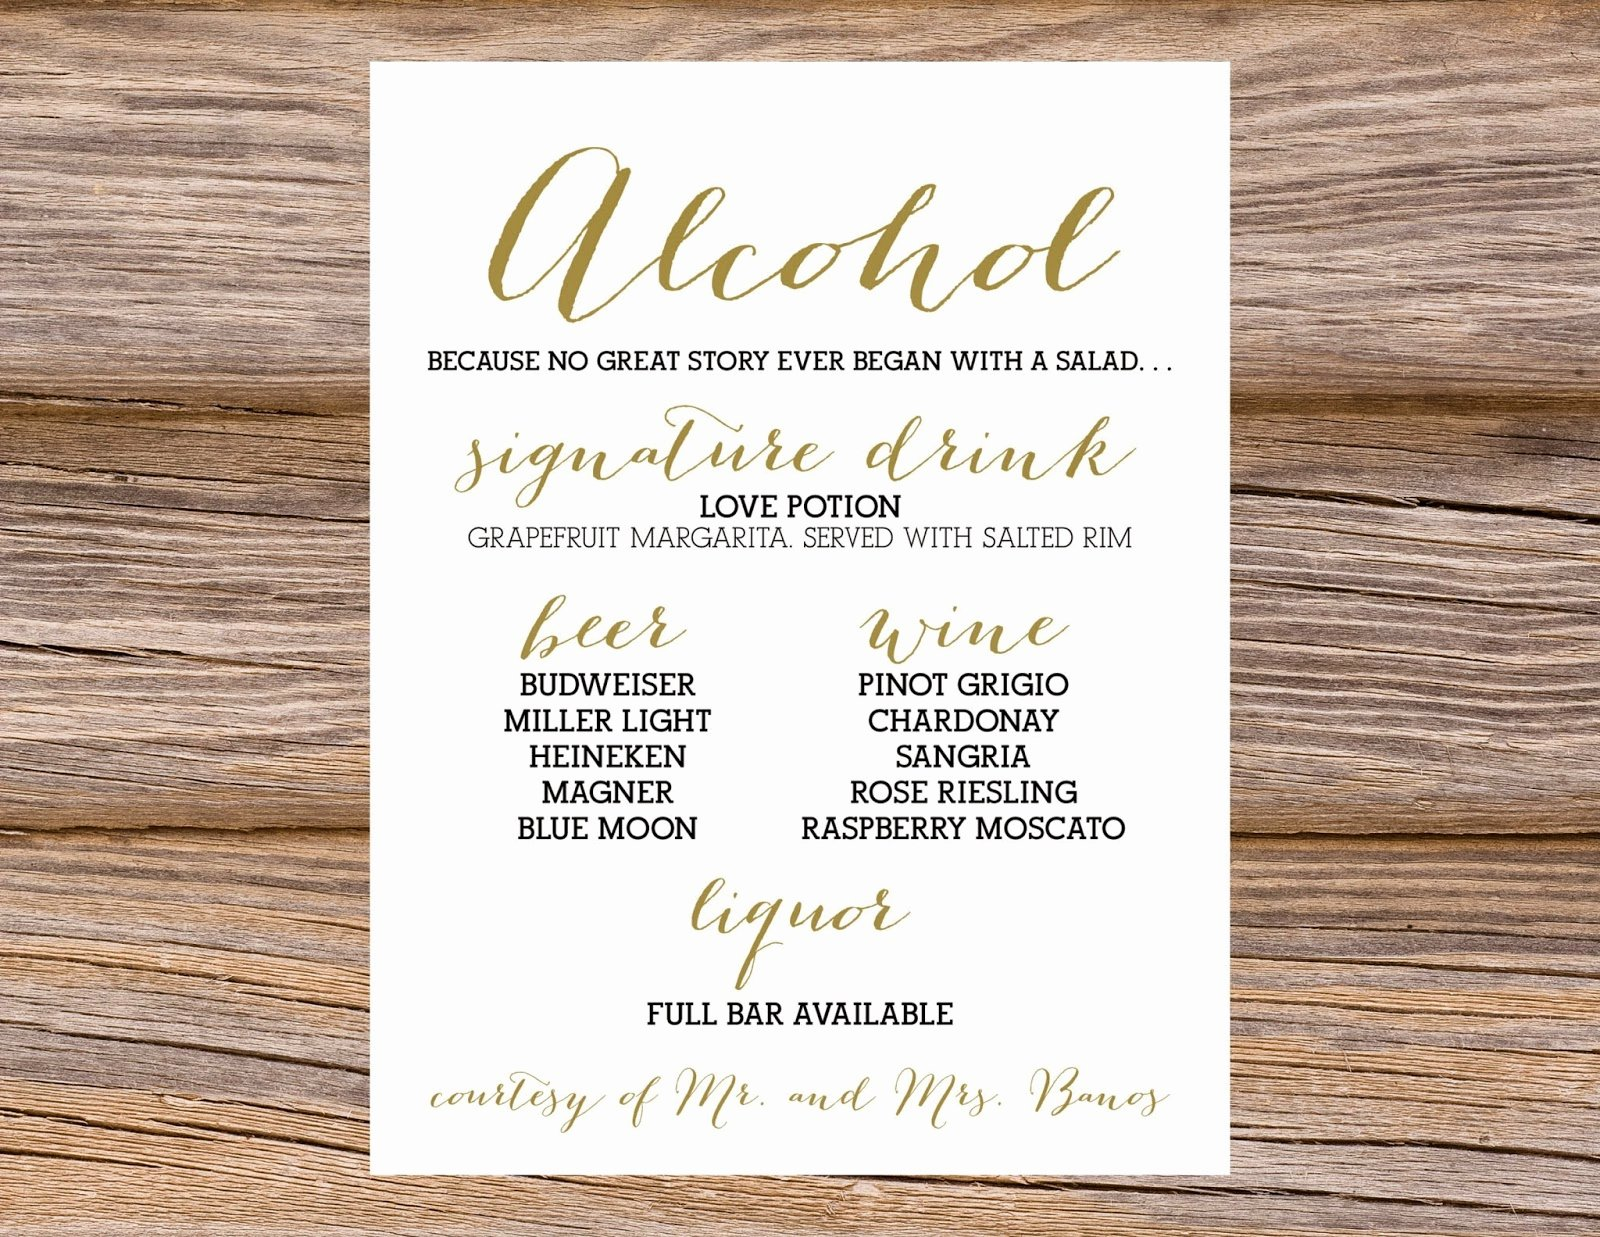 Wedding Bar Menu Template Awesome Sugar Queens Wedding Calligraphy Bar Menus